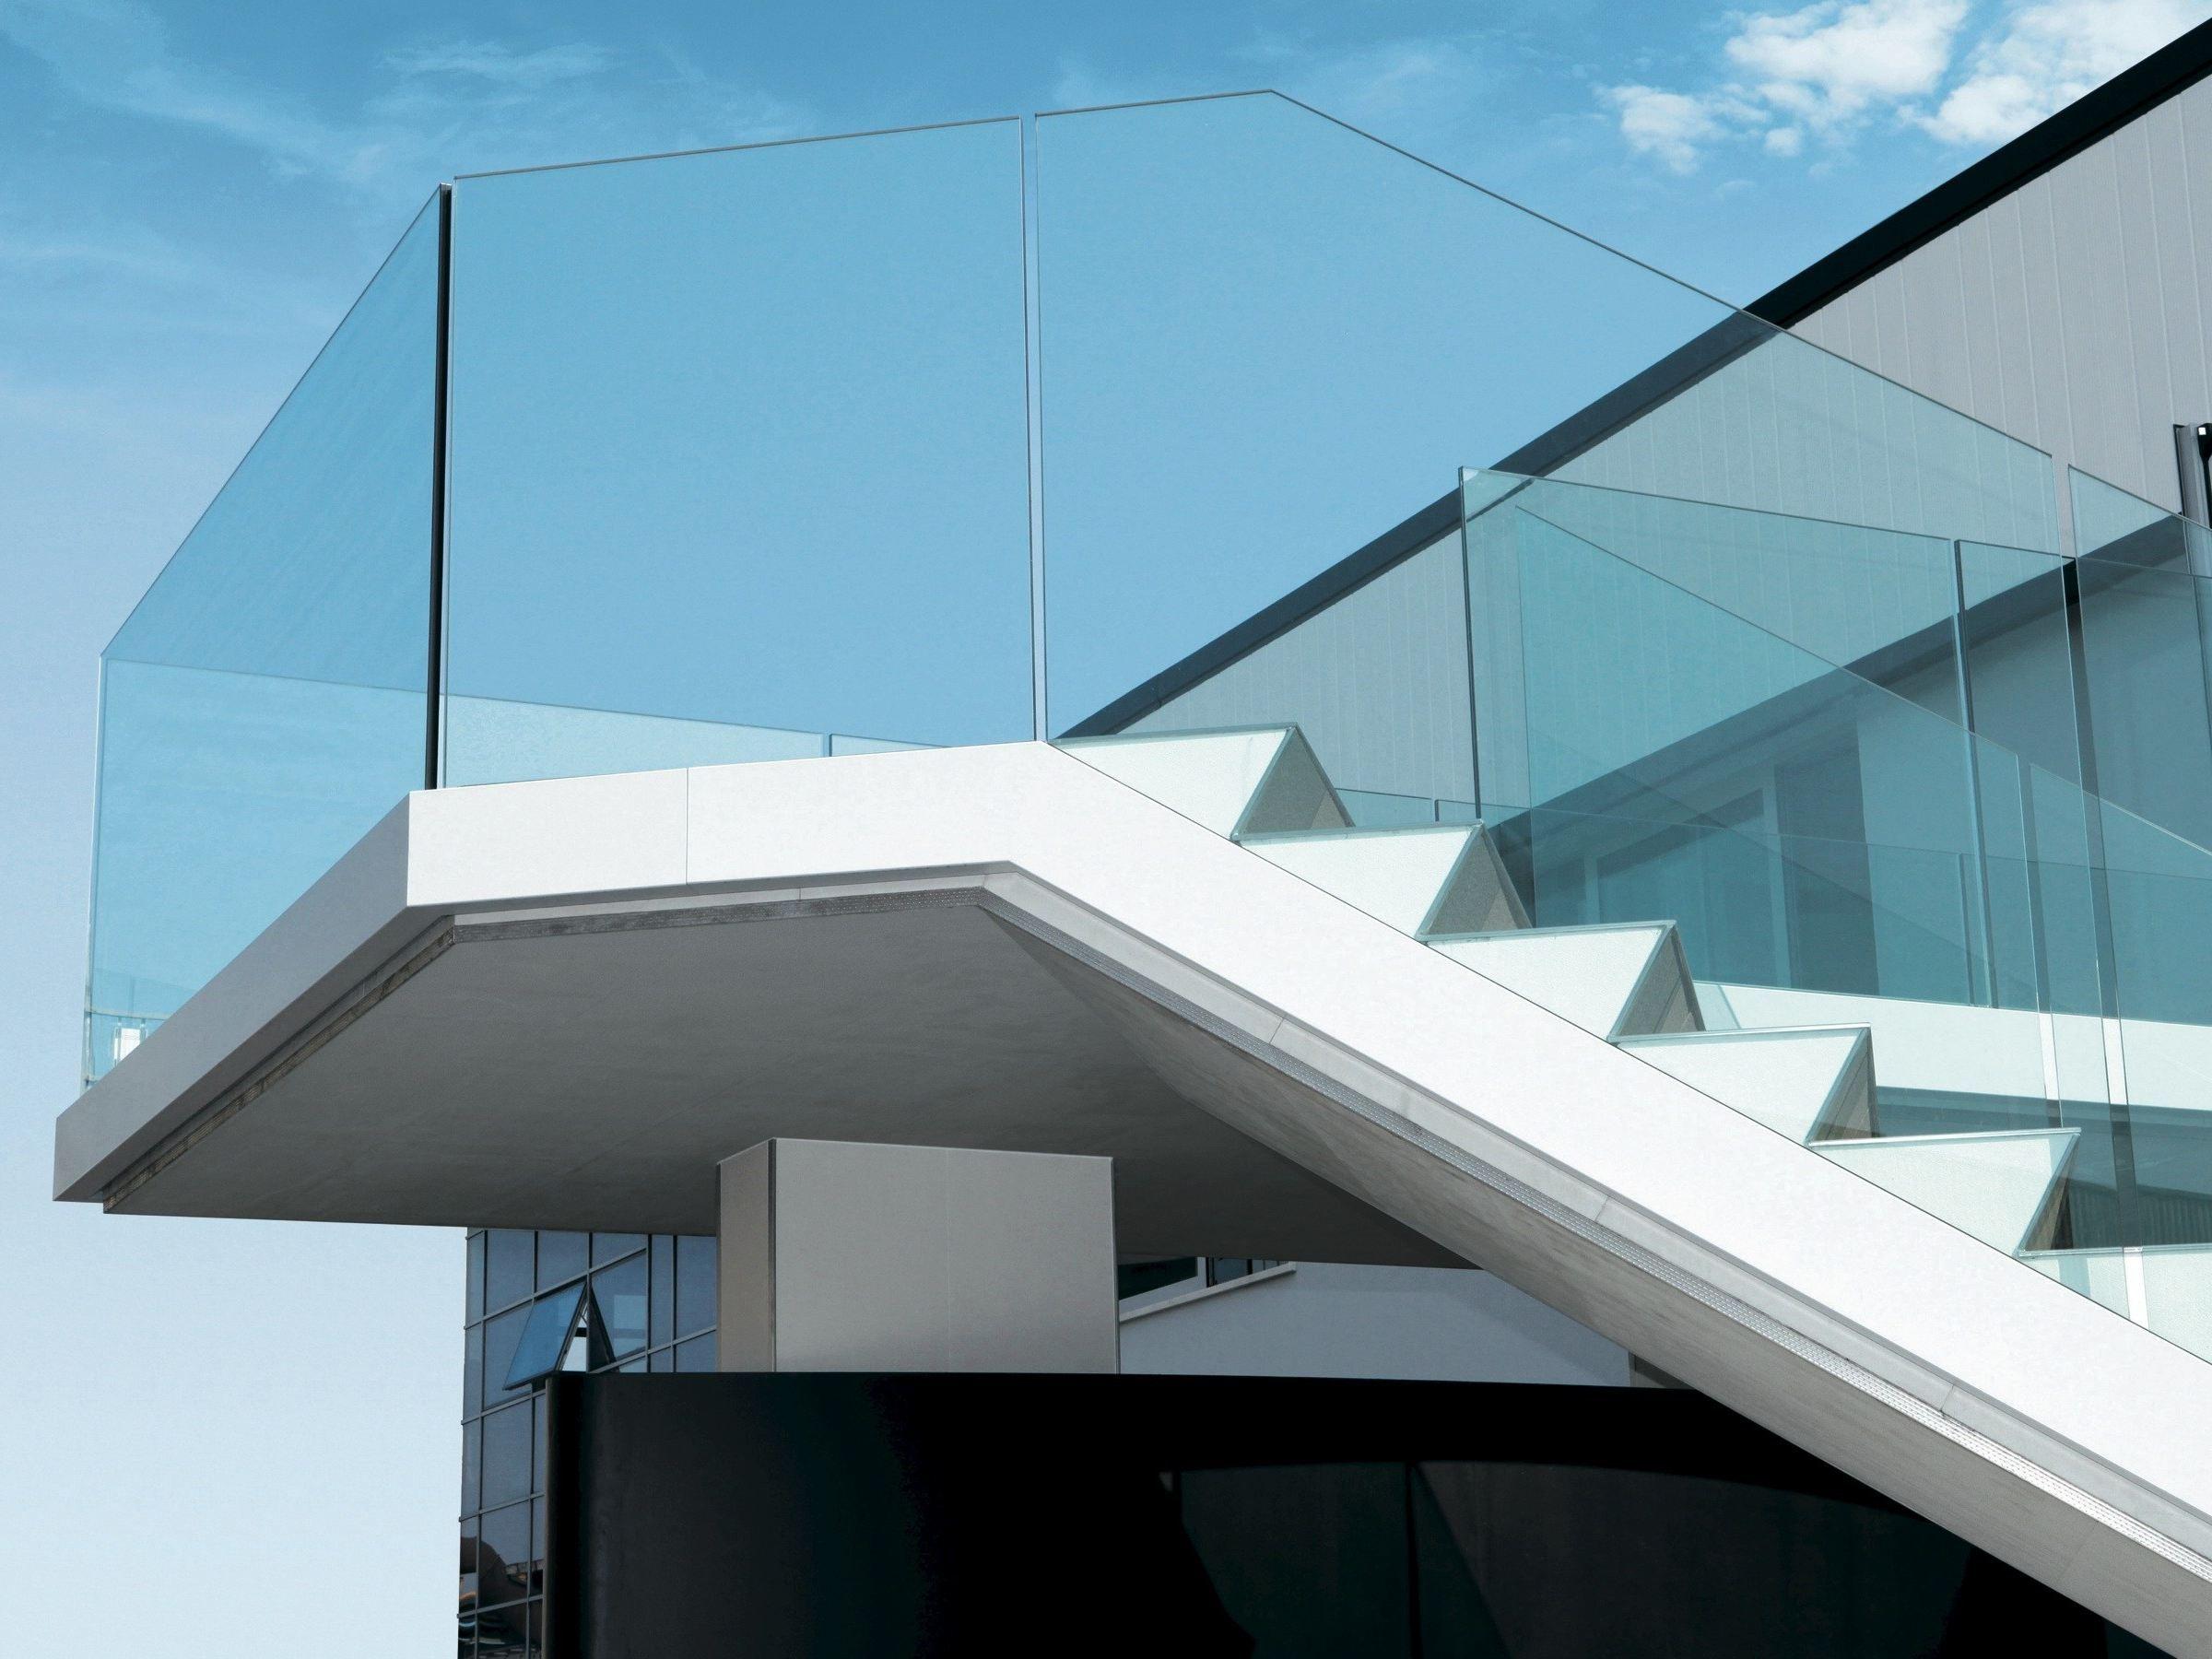 Garde corps en aluminium et verre pour terrasse balcon for Balustrade en verre exterieur